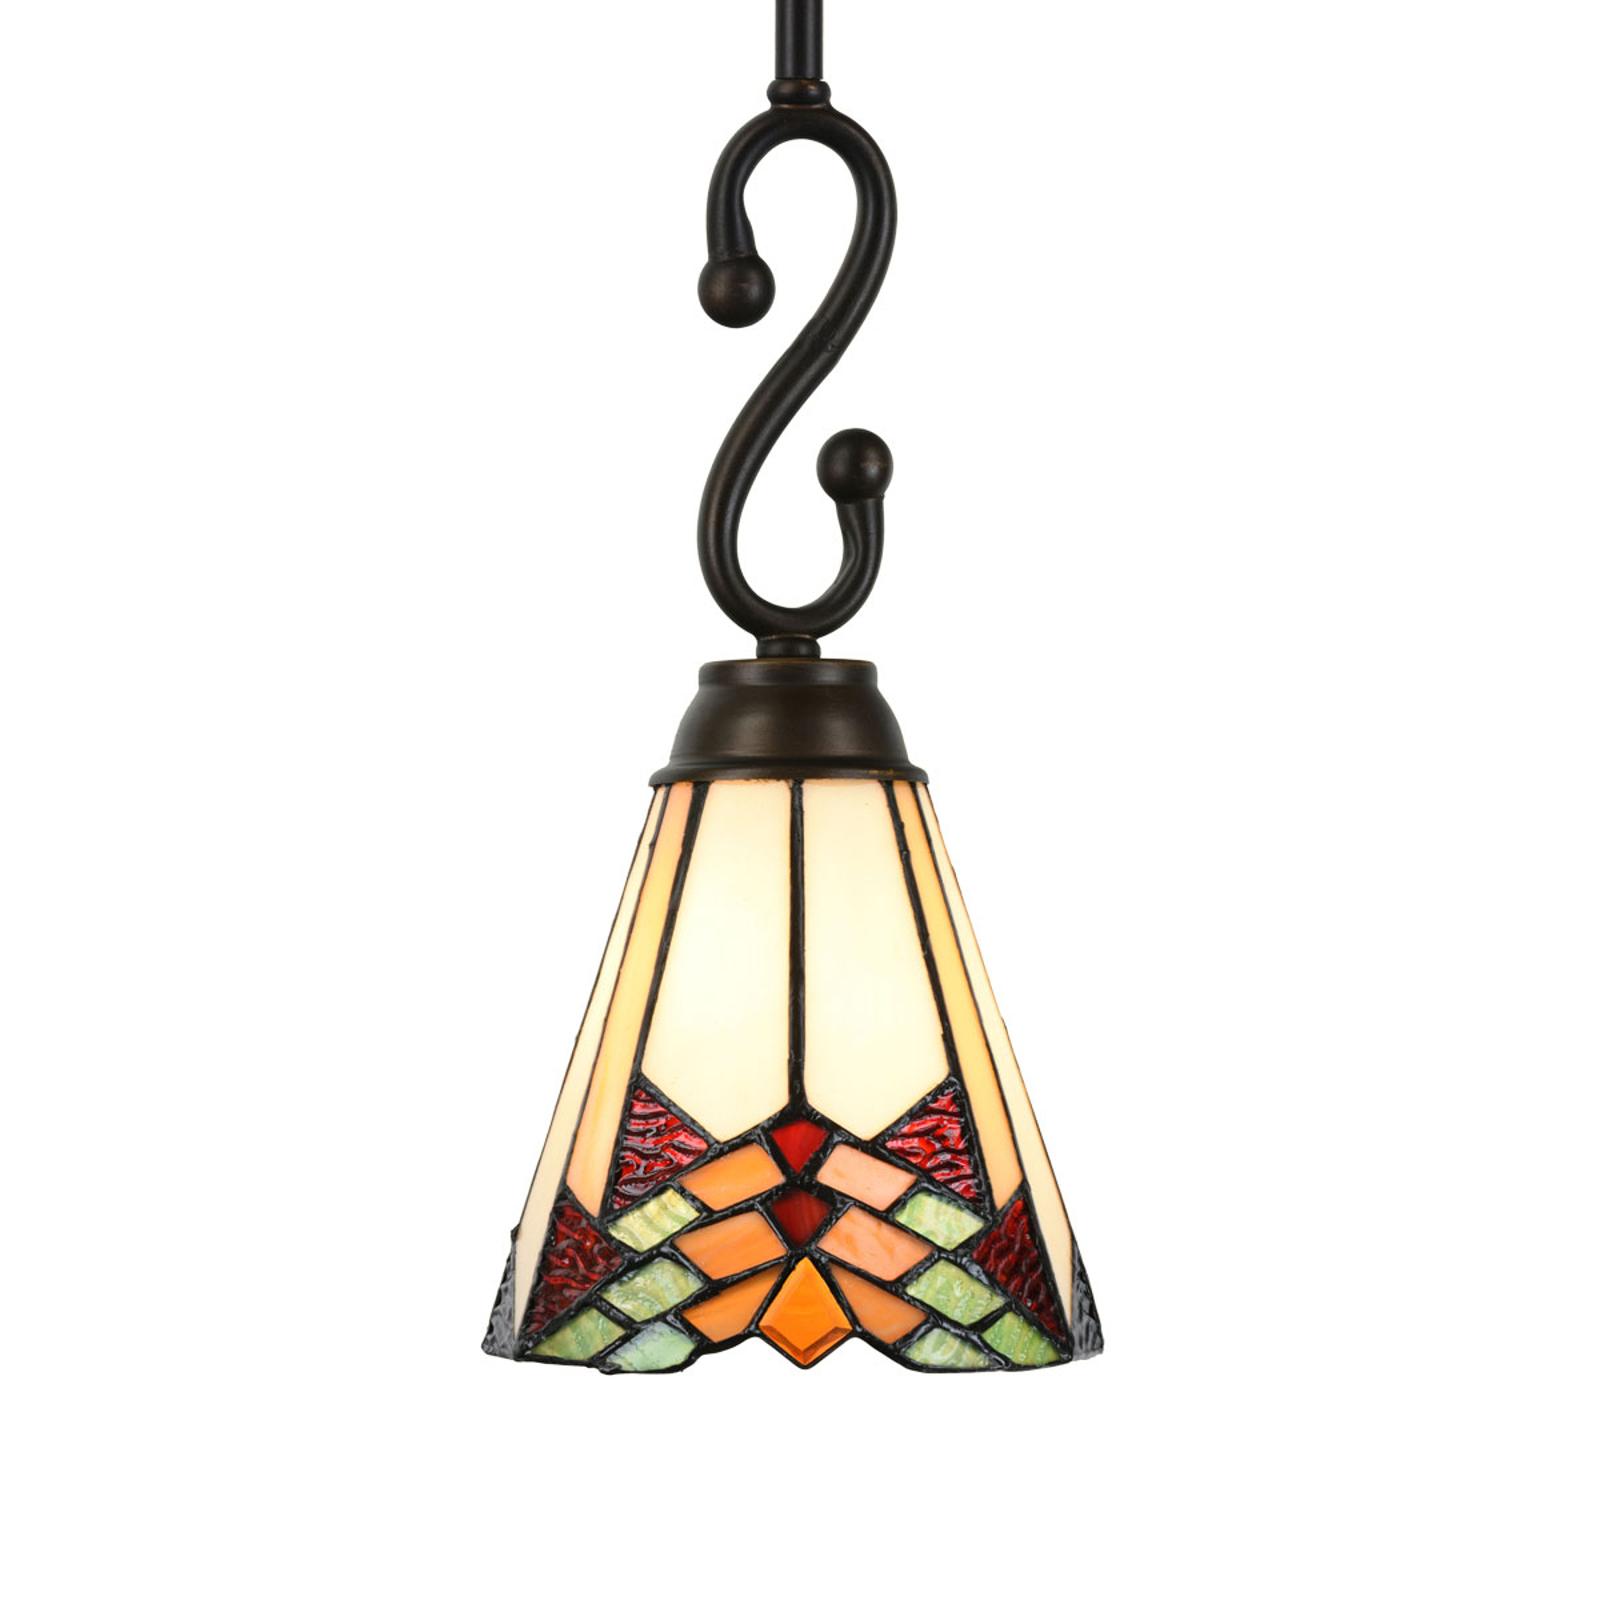 5965 hengelampe i Tiffany-design, 1 lyskilde